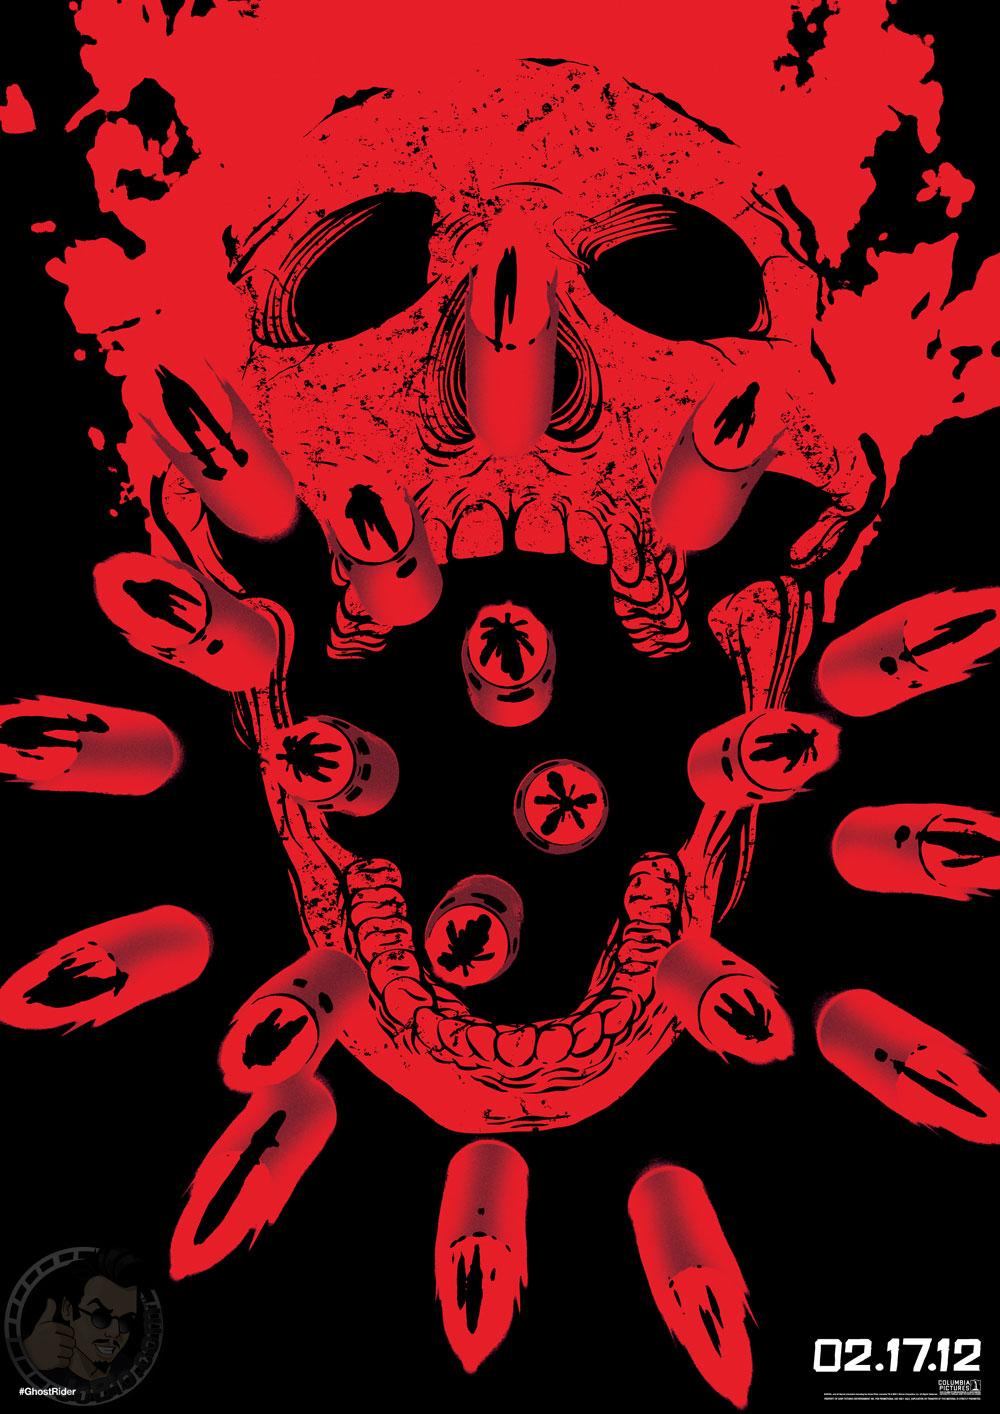 http://collider.com/wp-content/uploads/ghost-rider-spirit-of-vengeance-poster-art-1.jpg